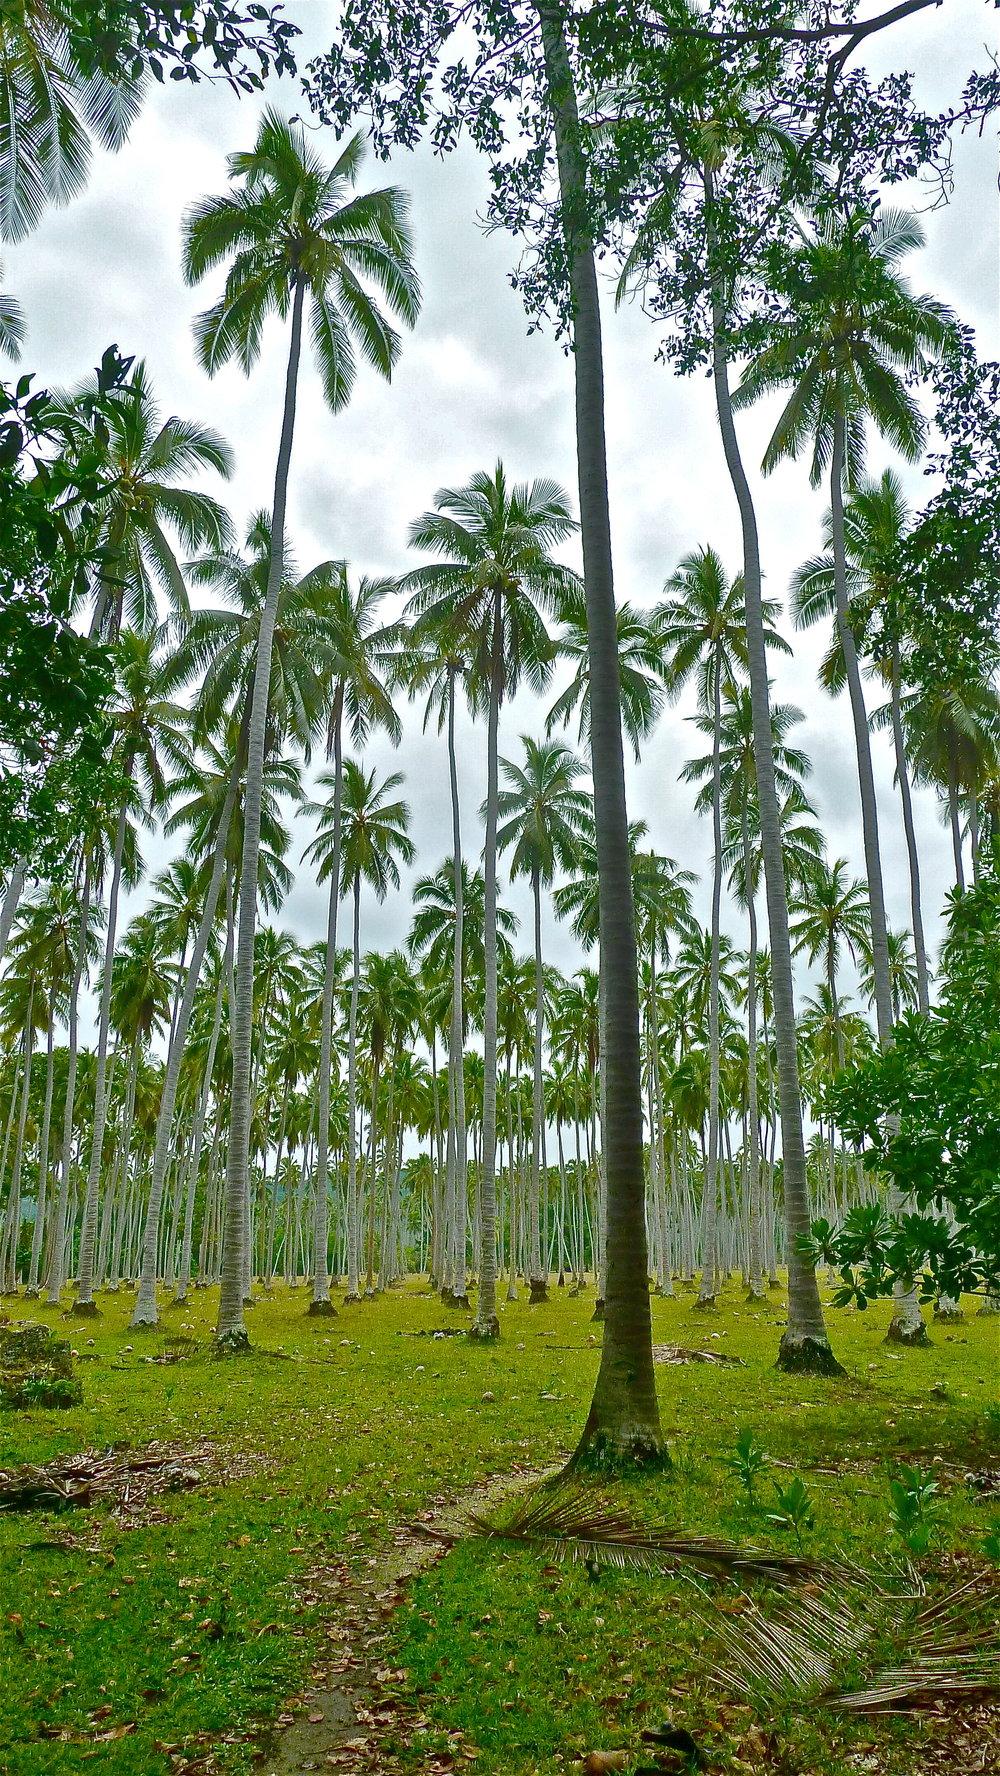 Coconut plantation, Ratua Island, Vanuatu